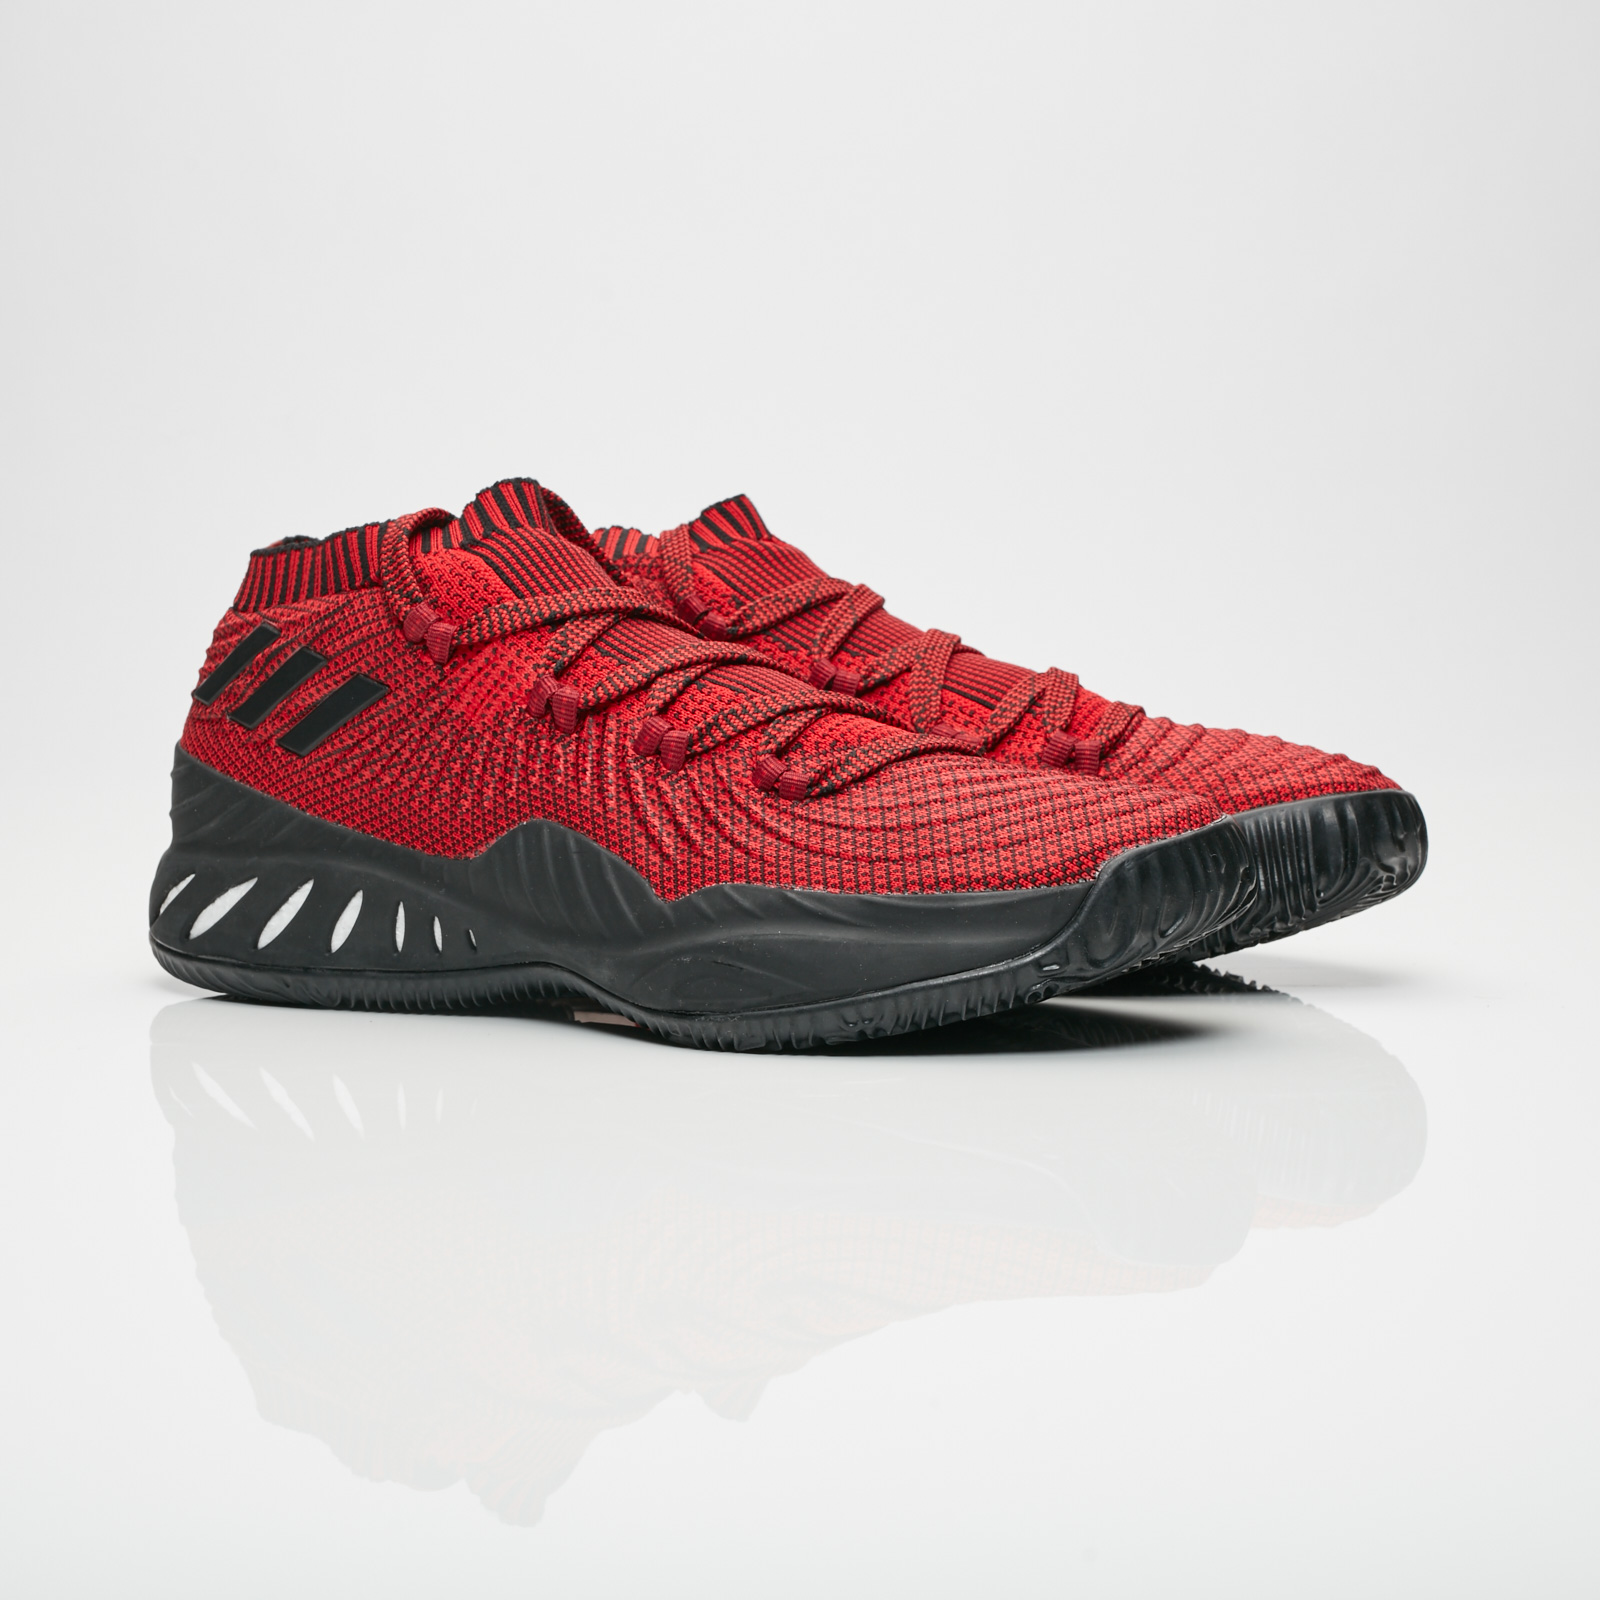 adidas pazzo esplosivo cq0440 sneakersnstuff scarpe basse